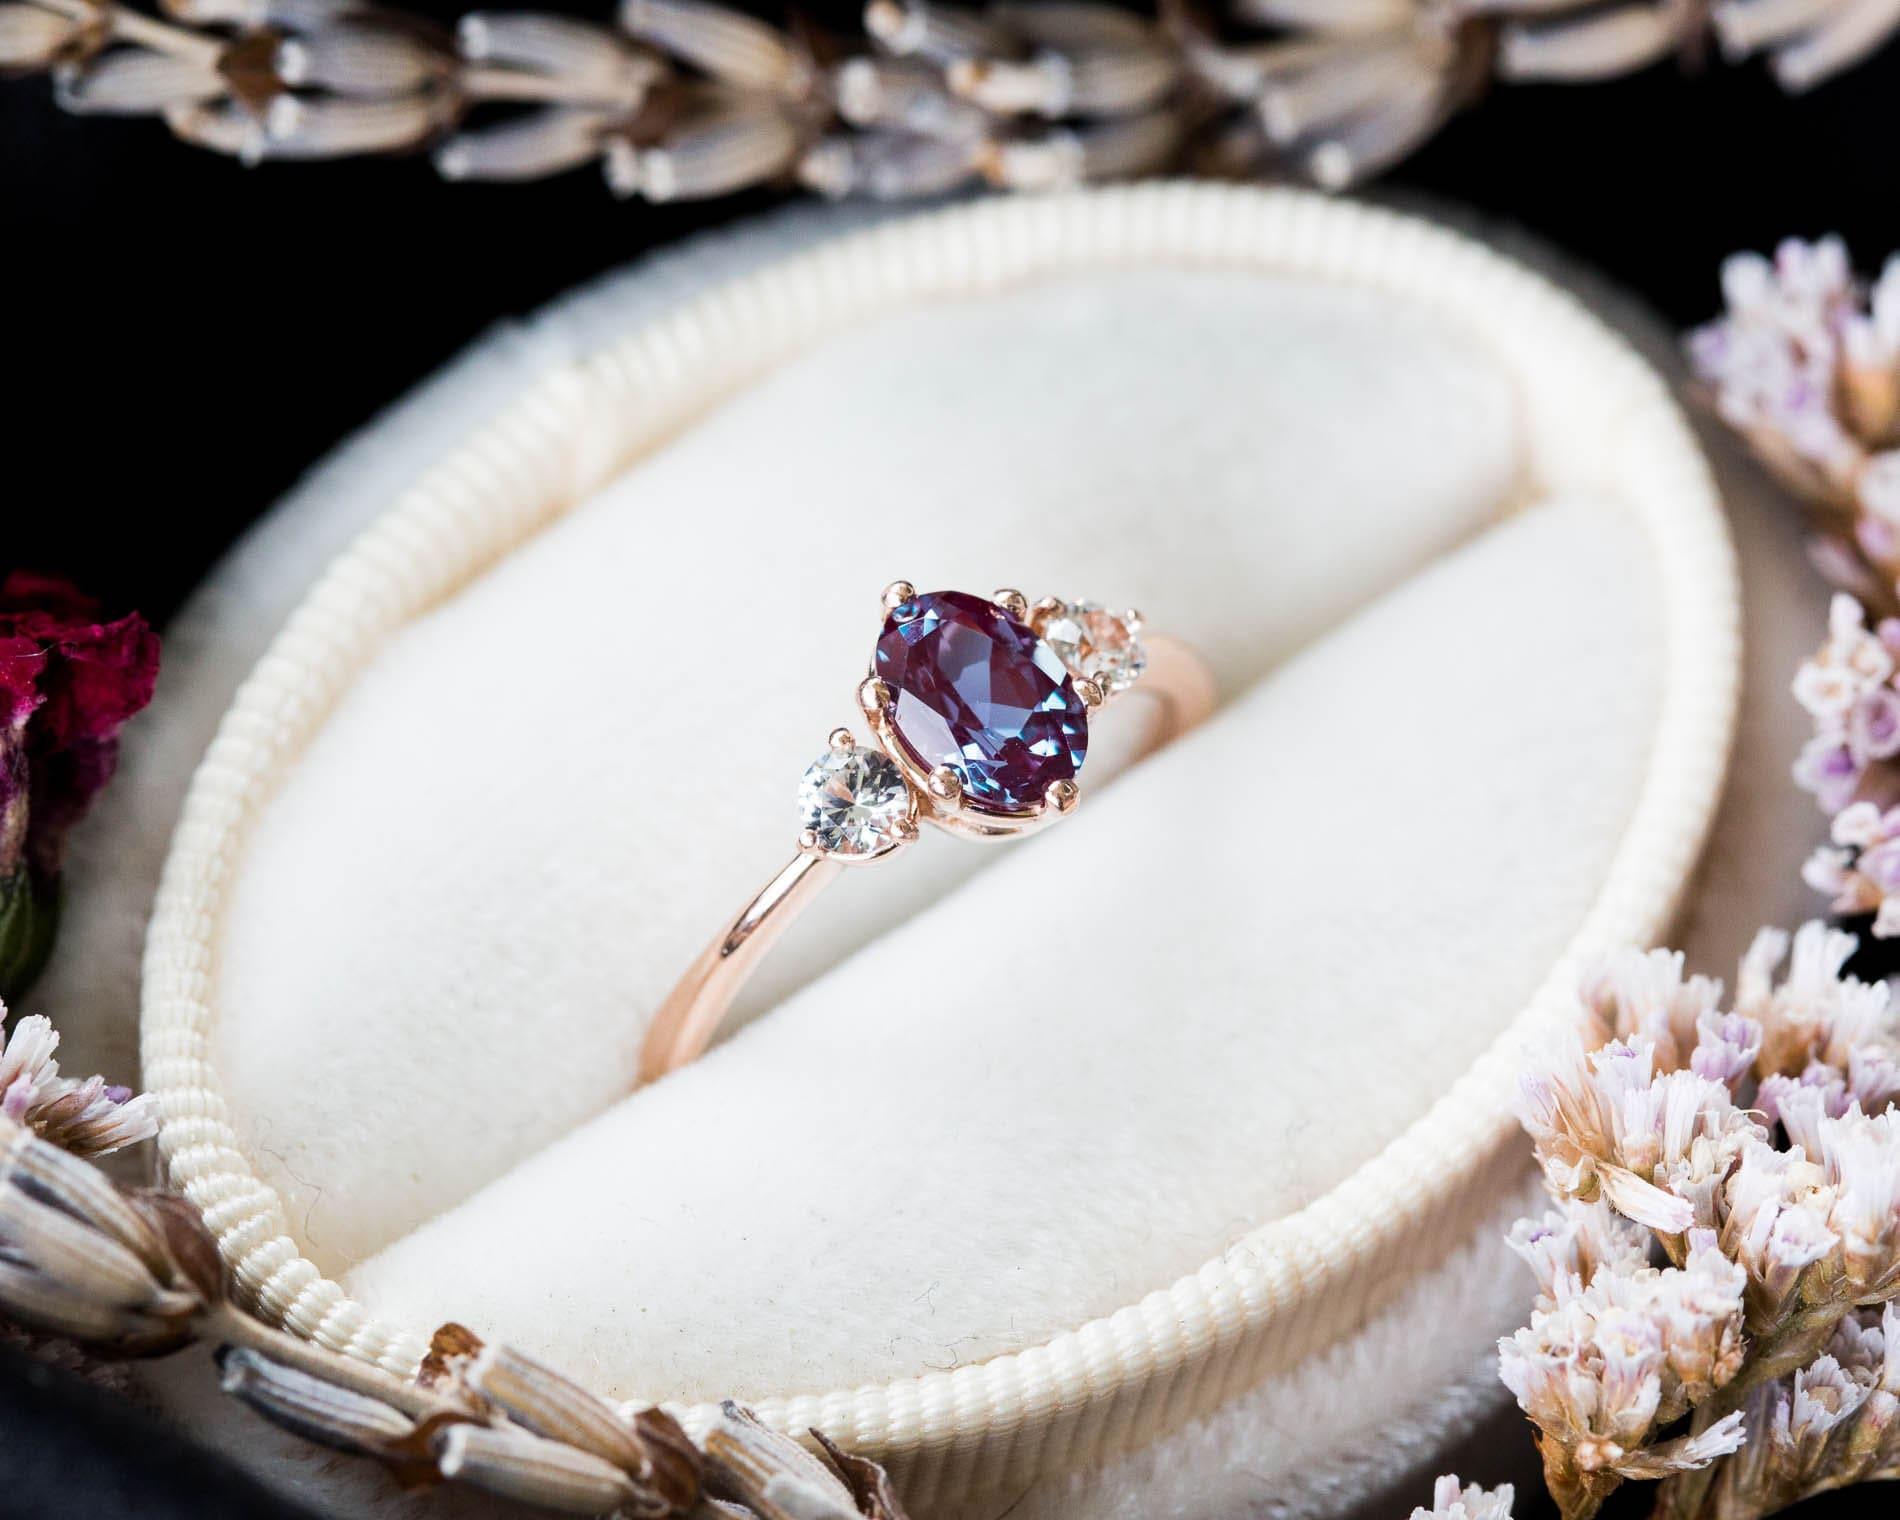 821c9cf198712 Alexandrite sapphire three stone 14k gold engagement ring, alexandrite  engagement ring, alternative bridal, alexandrite rose gold ring